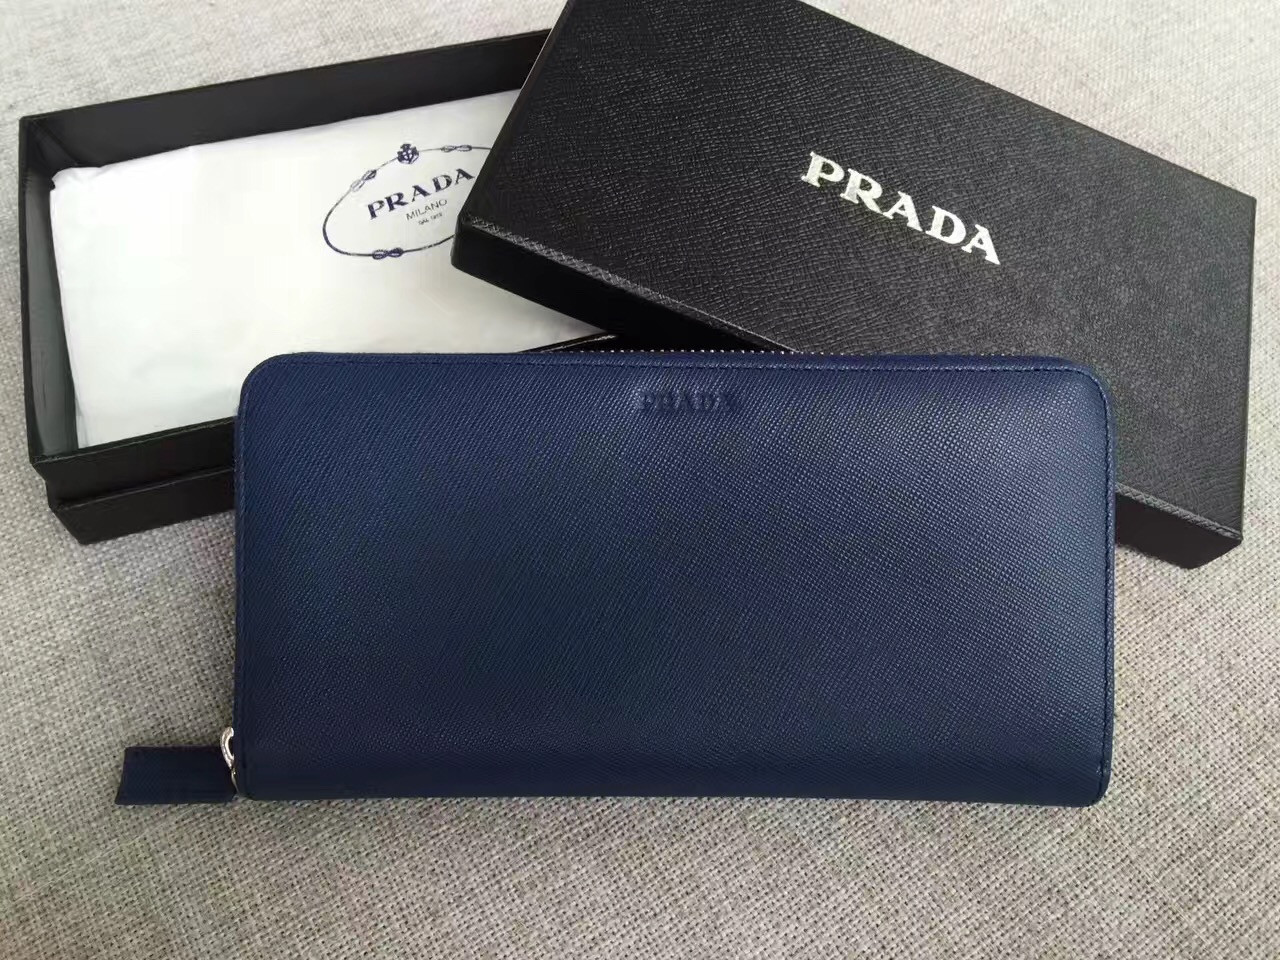 Мужской кошелек Prada (Прада)